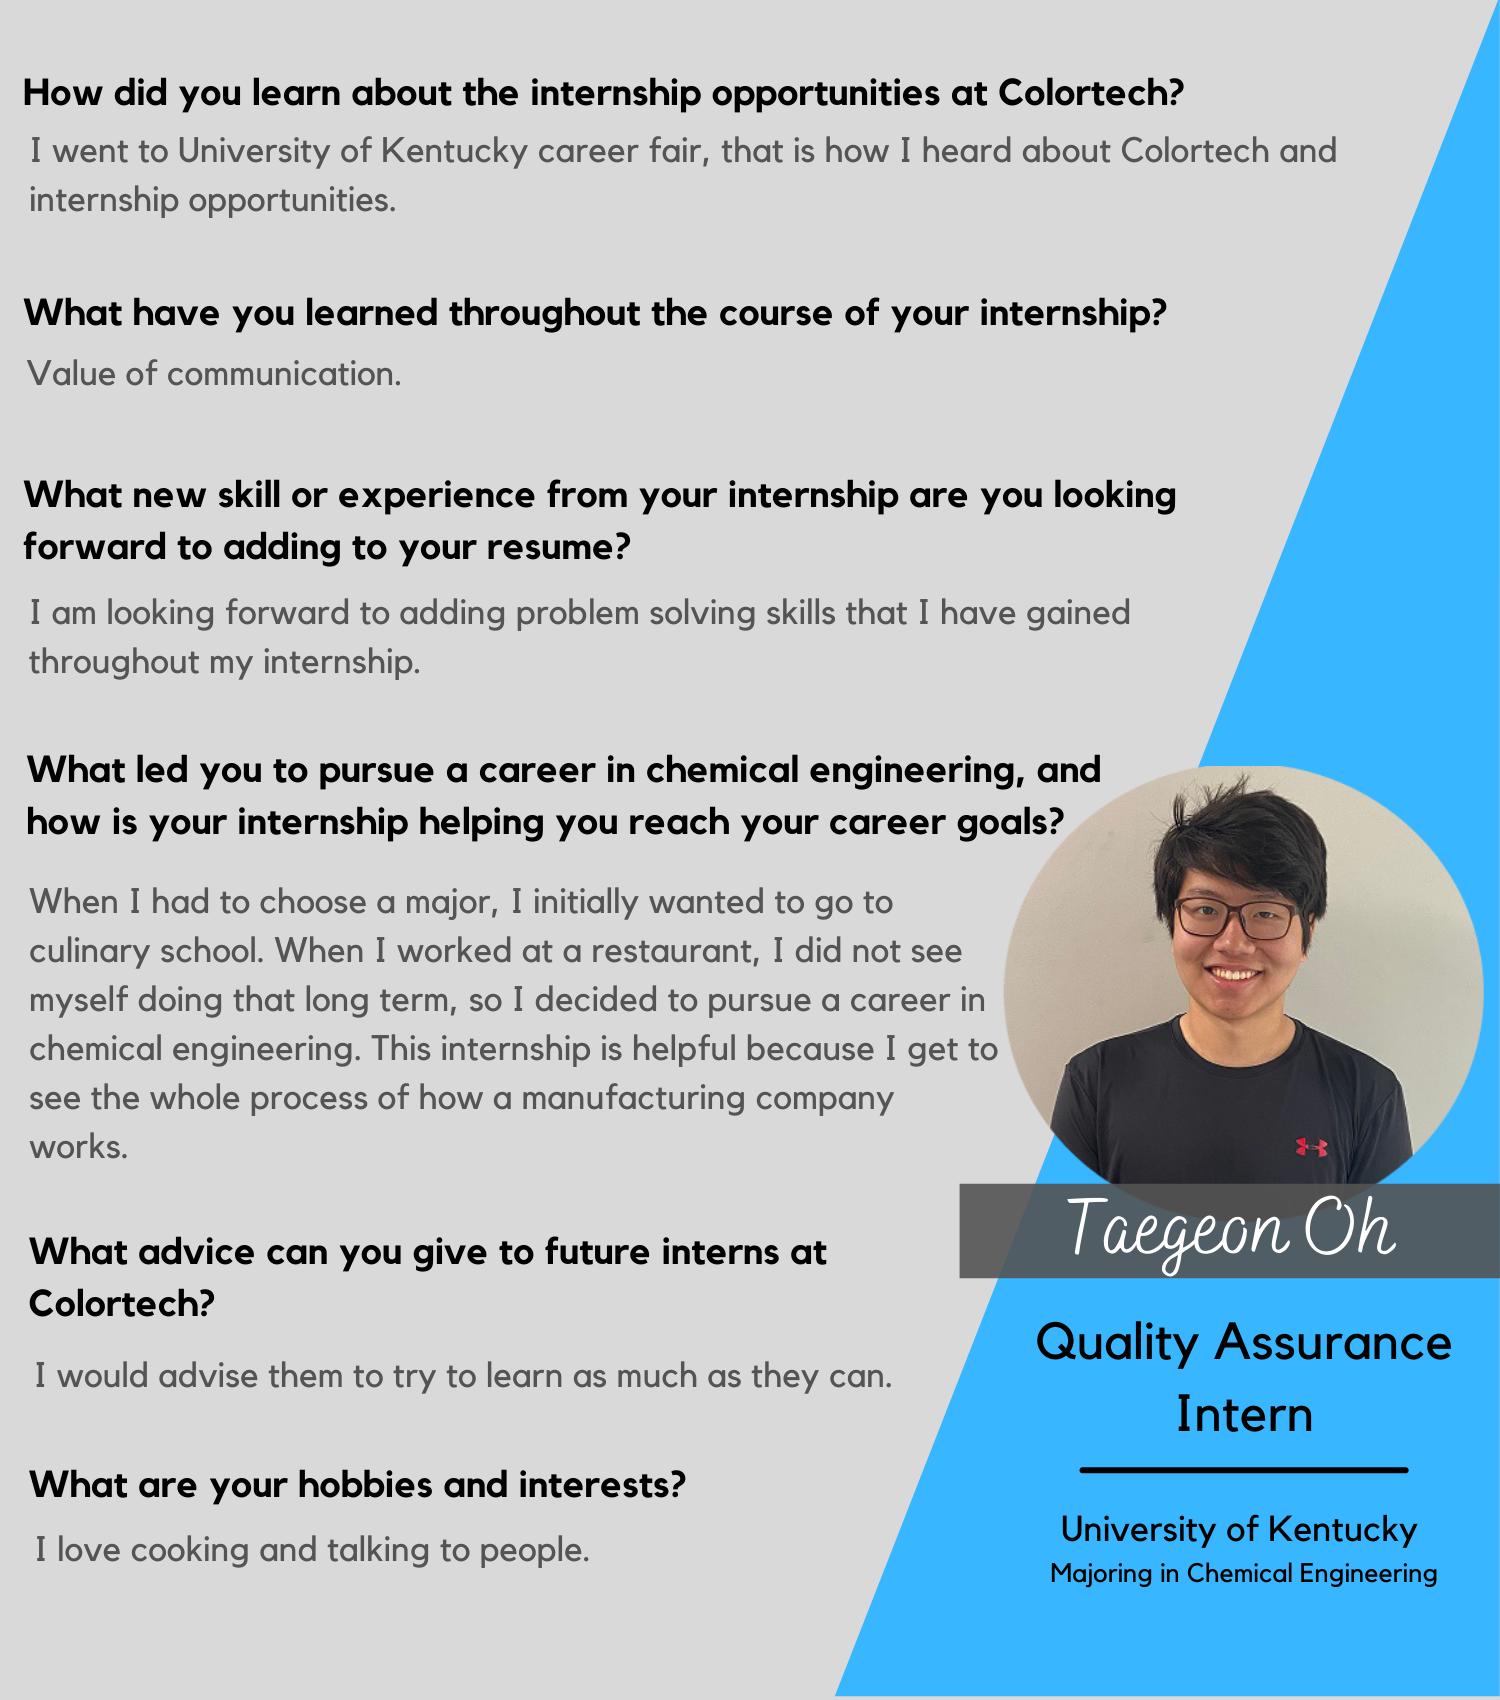 Taegon Oh, Quality Assurance Intern